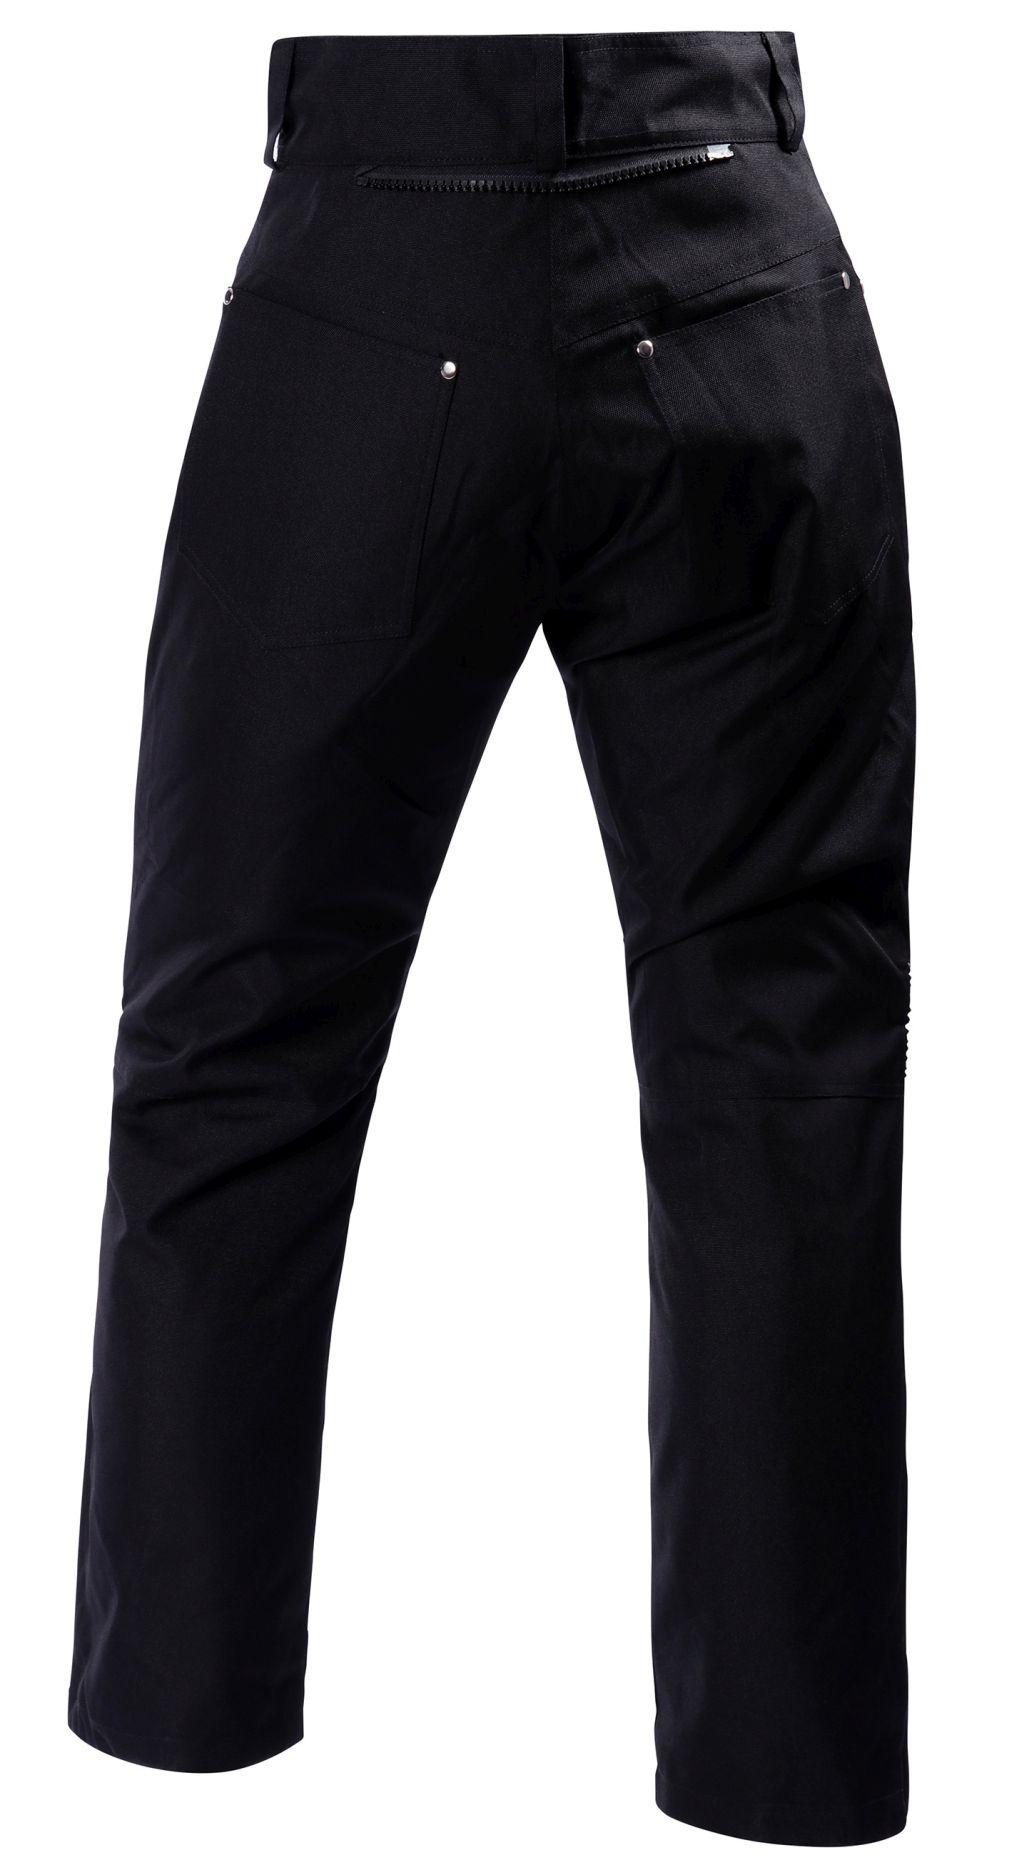 Damen Motorrad Hose Schwarz im Jeans Look Motorradhose S M L XL XXL XXXL 4 XL